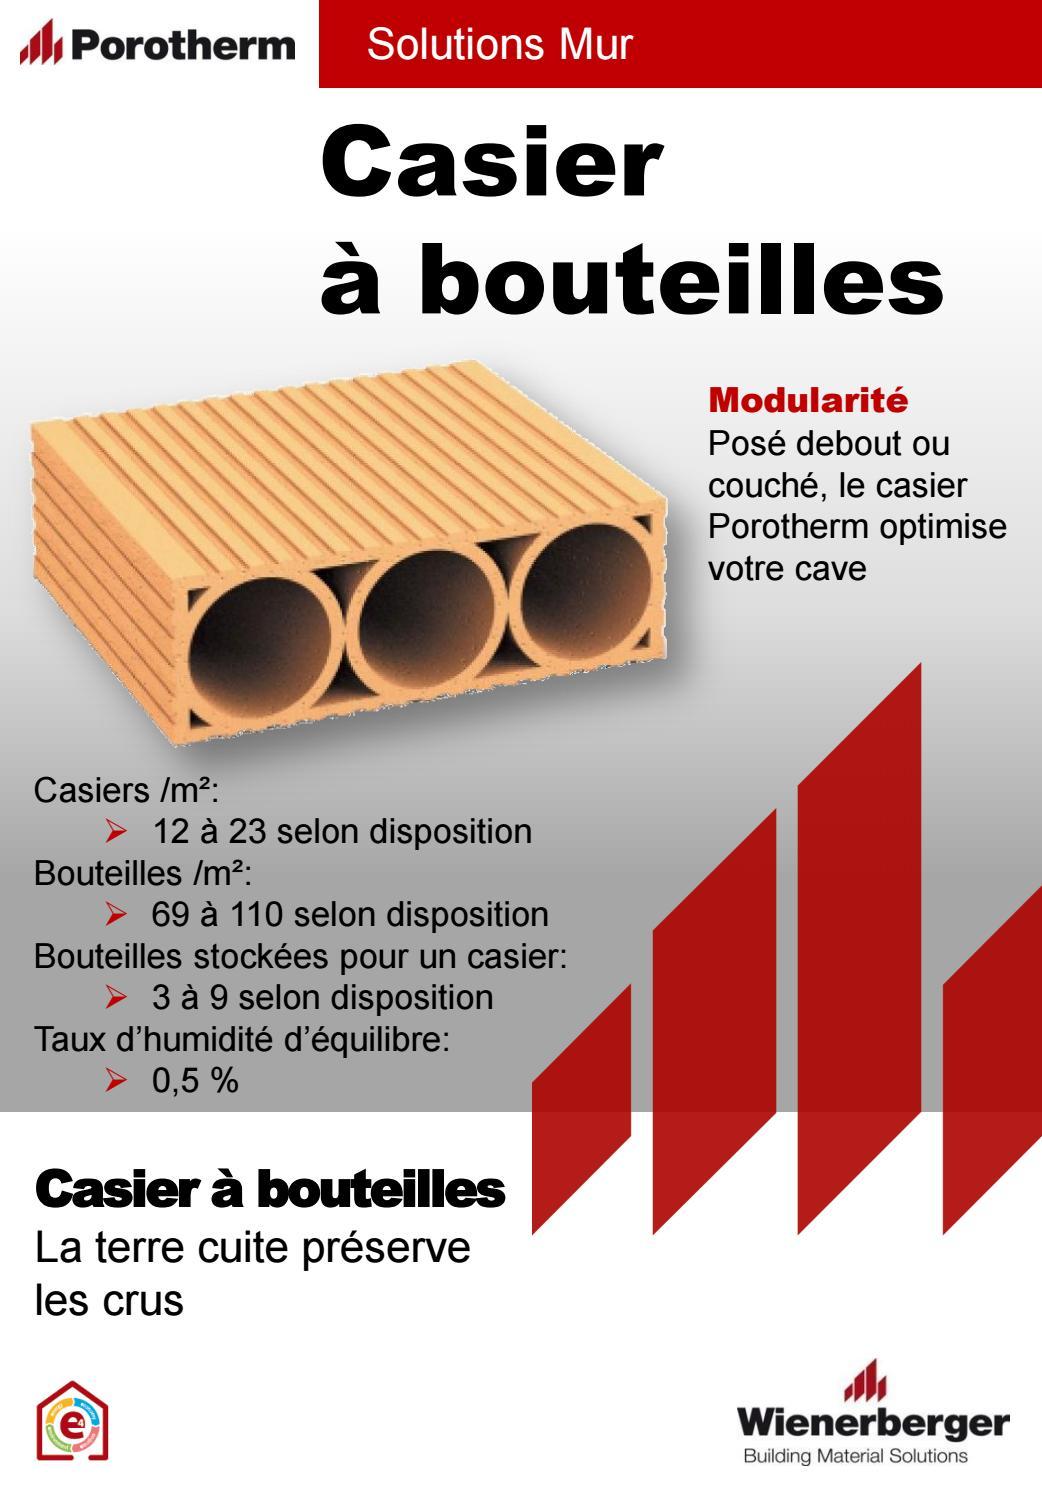 Fiche Produit Casier A Bouteille 3 Trous Porotherm By Wienerberger Ag Issuu